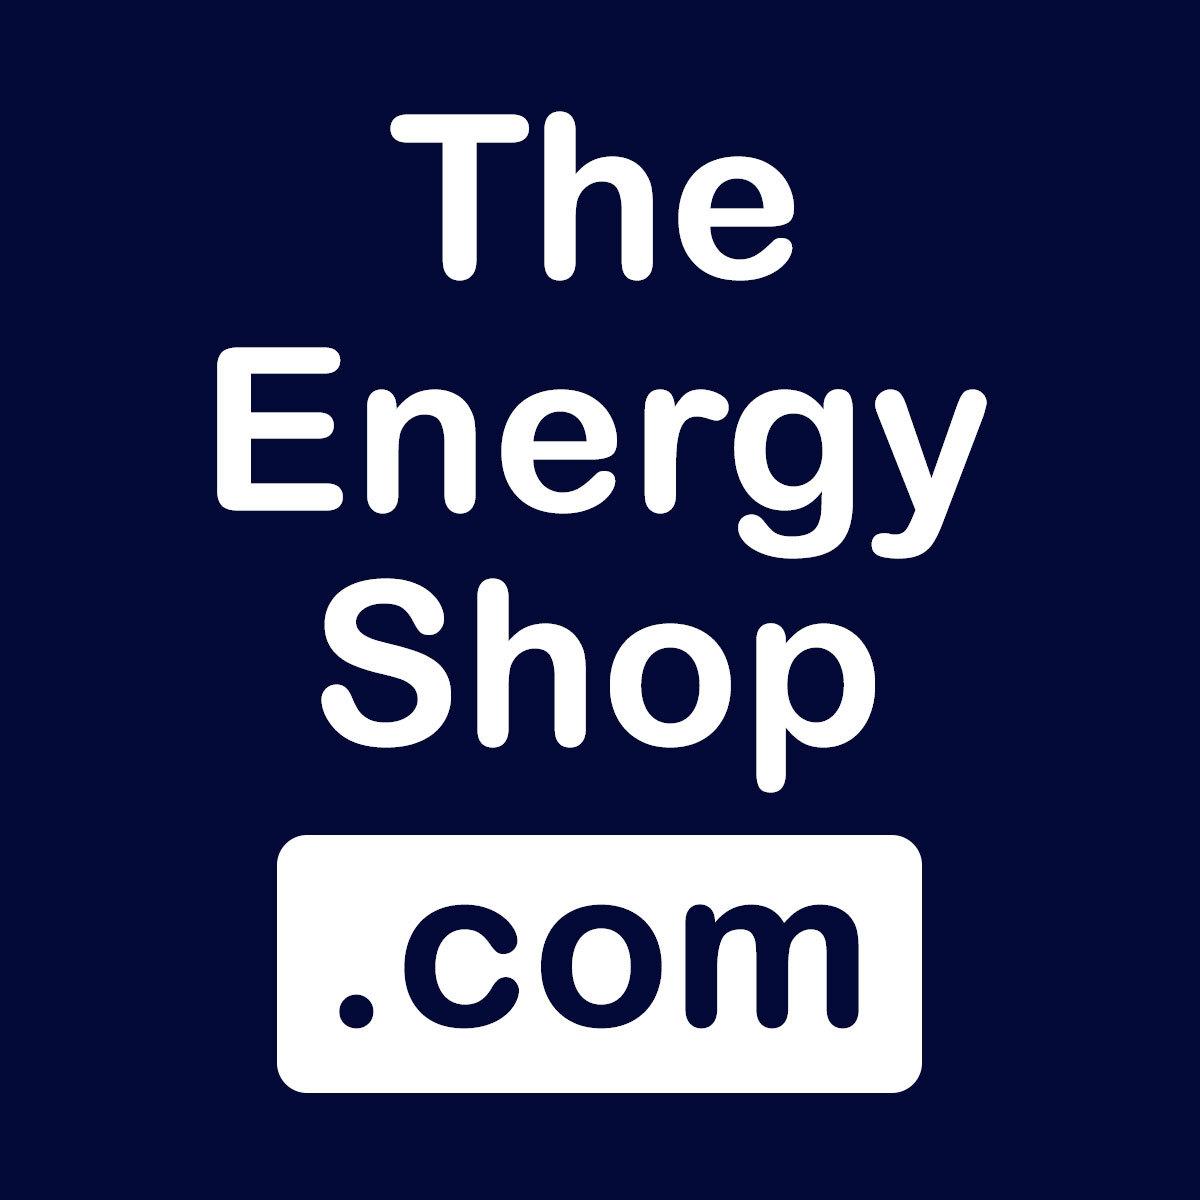 Best Energy Deals In November 2020 The Energy Shop